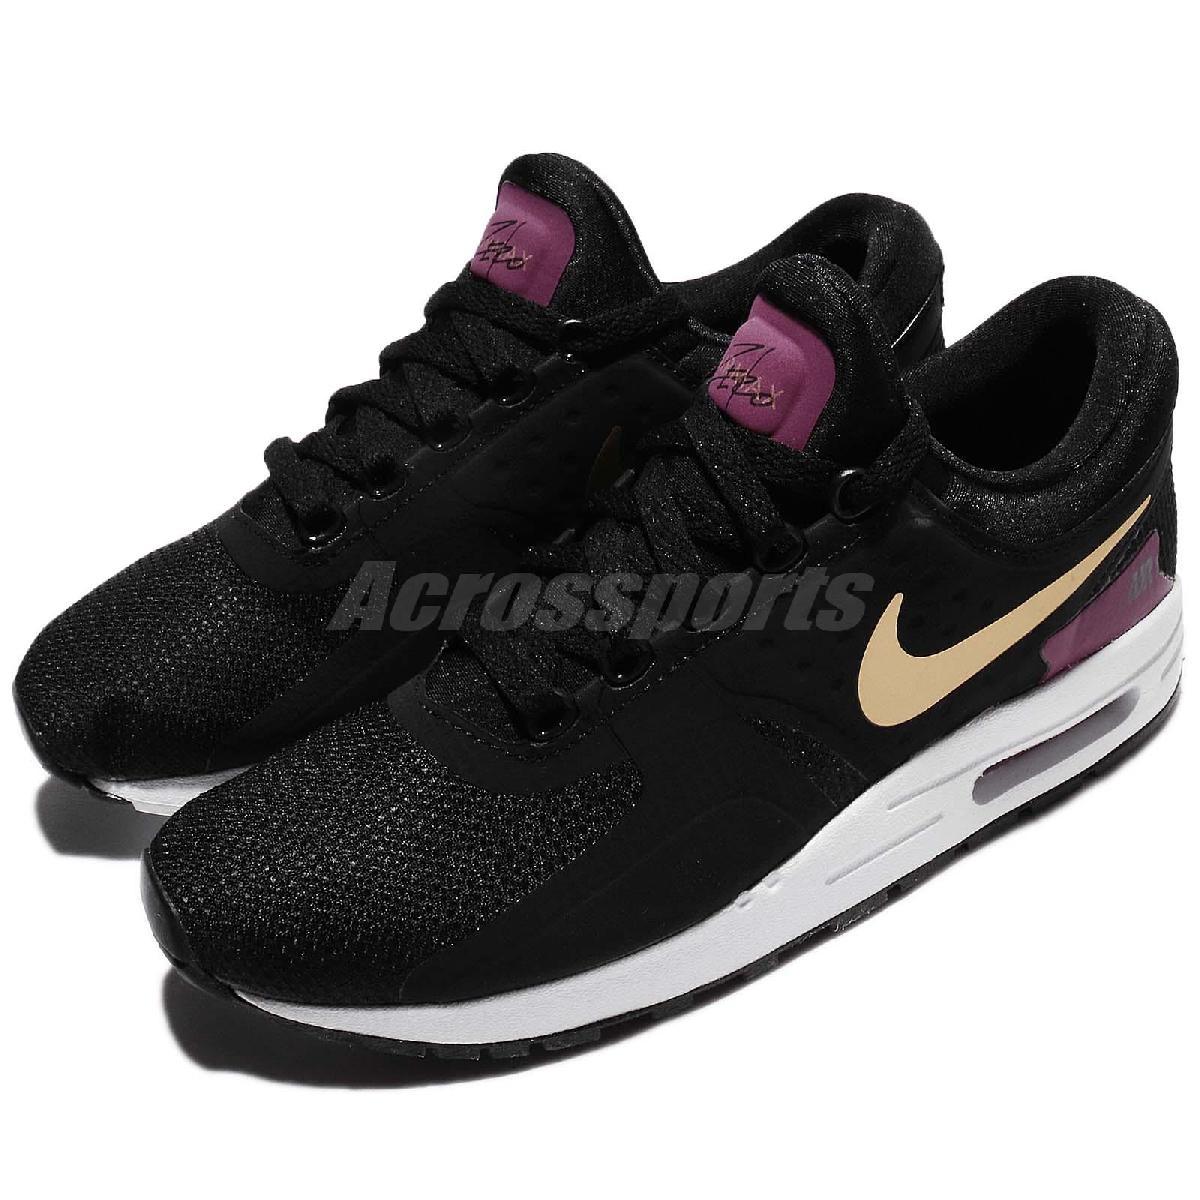 Nike休閒慢跑鞋Air Max Zero Essential GS黑金氣墊運動鞋基本款大童鞋女鞋PUMP306 881229-007